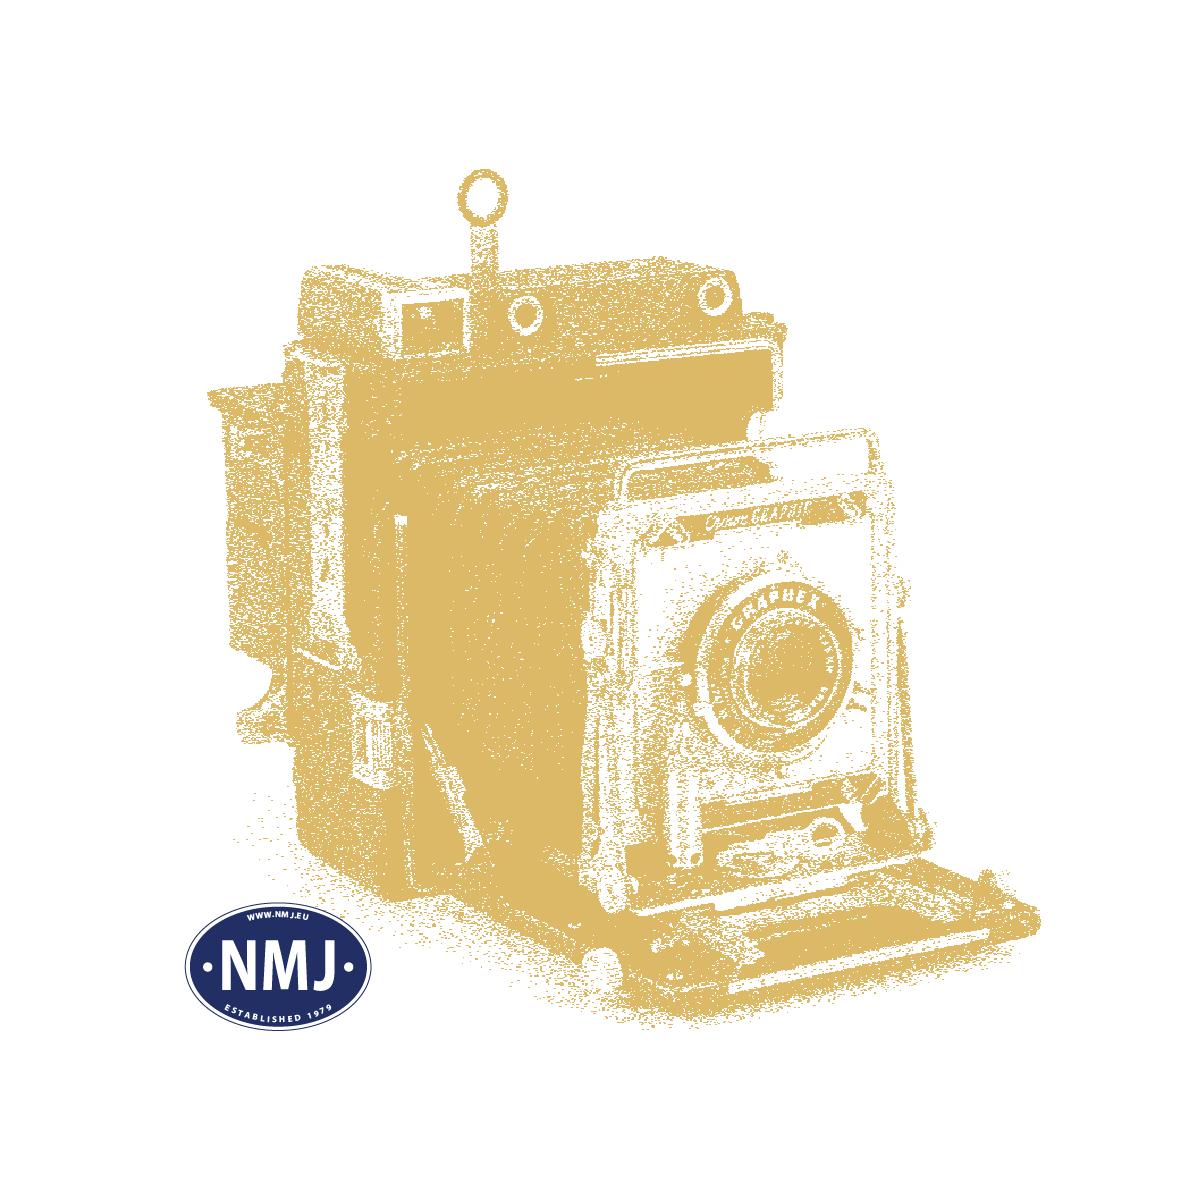 NMJTKAT17 - NMJ Topline und Skyline Katalog 2017